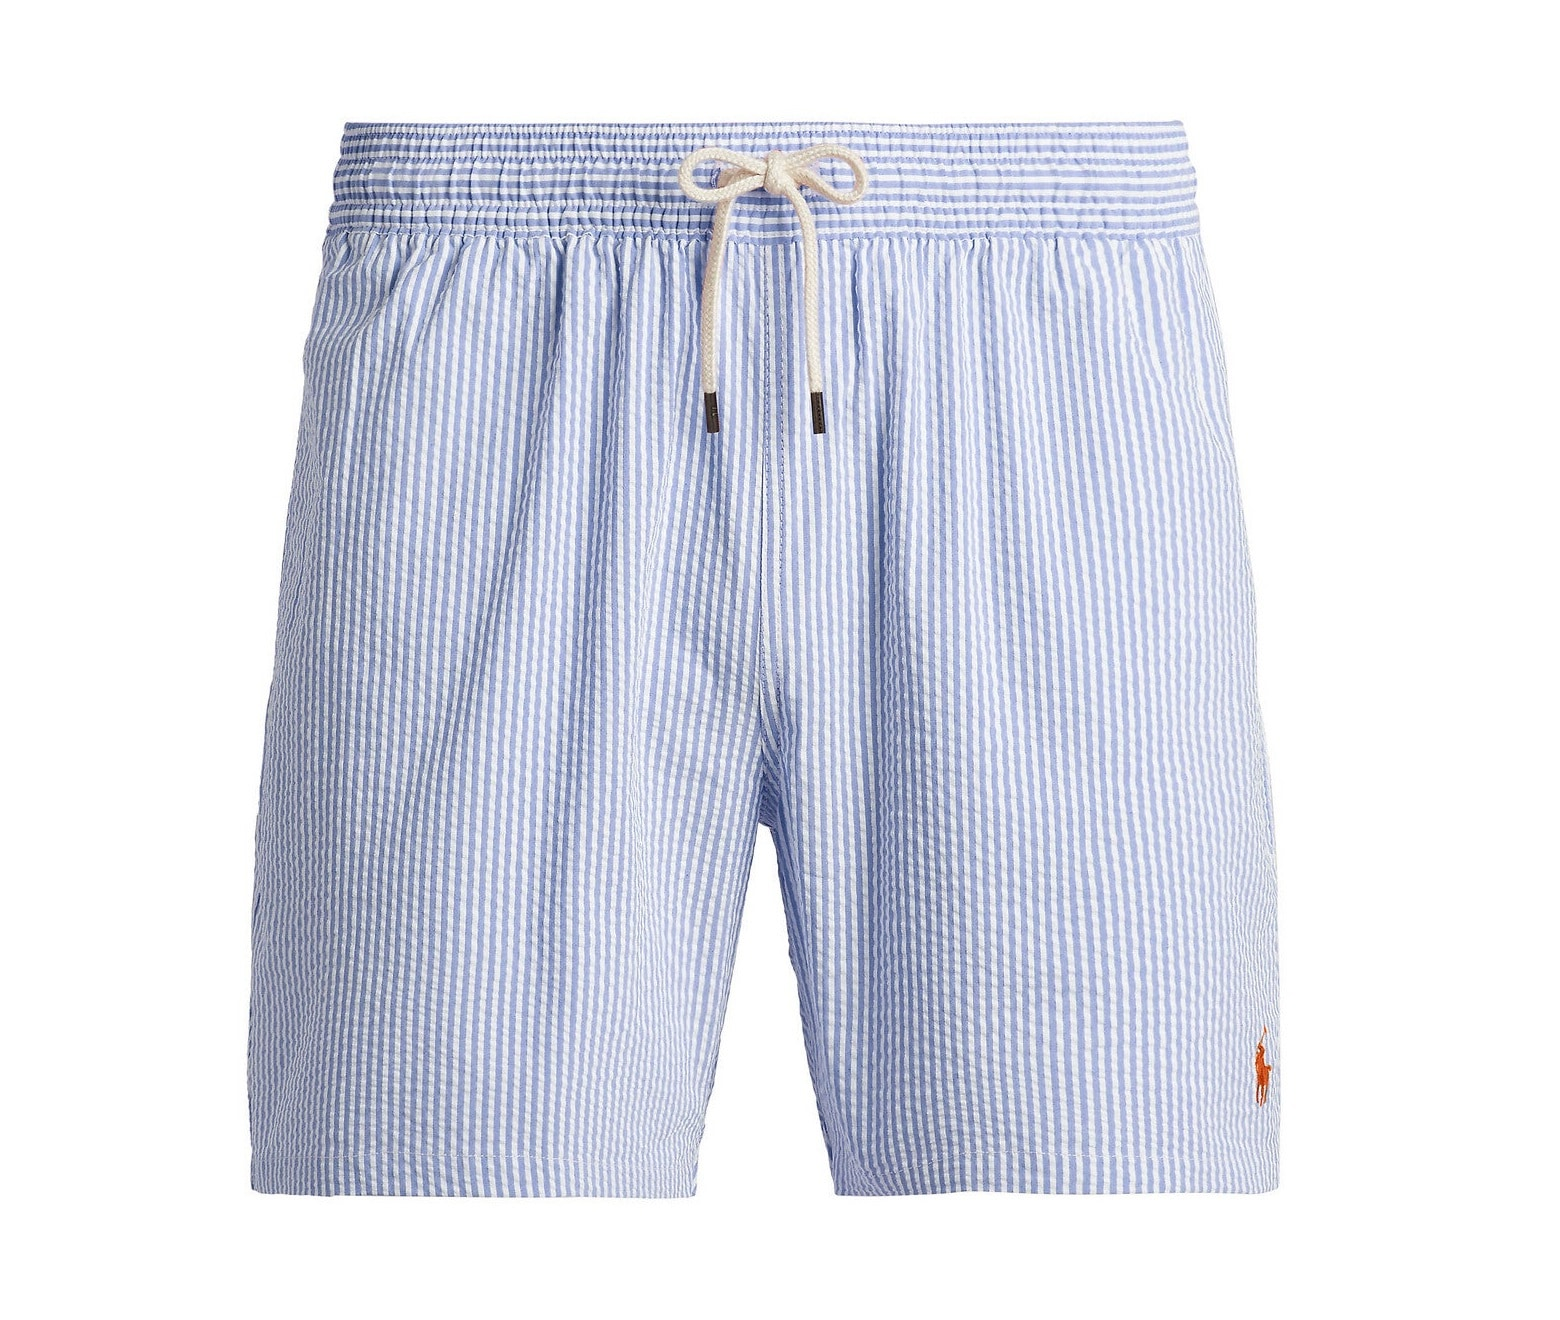 Maillots de bain homme 2021 - Short Polo Ralph Lauren